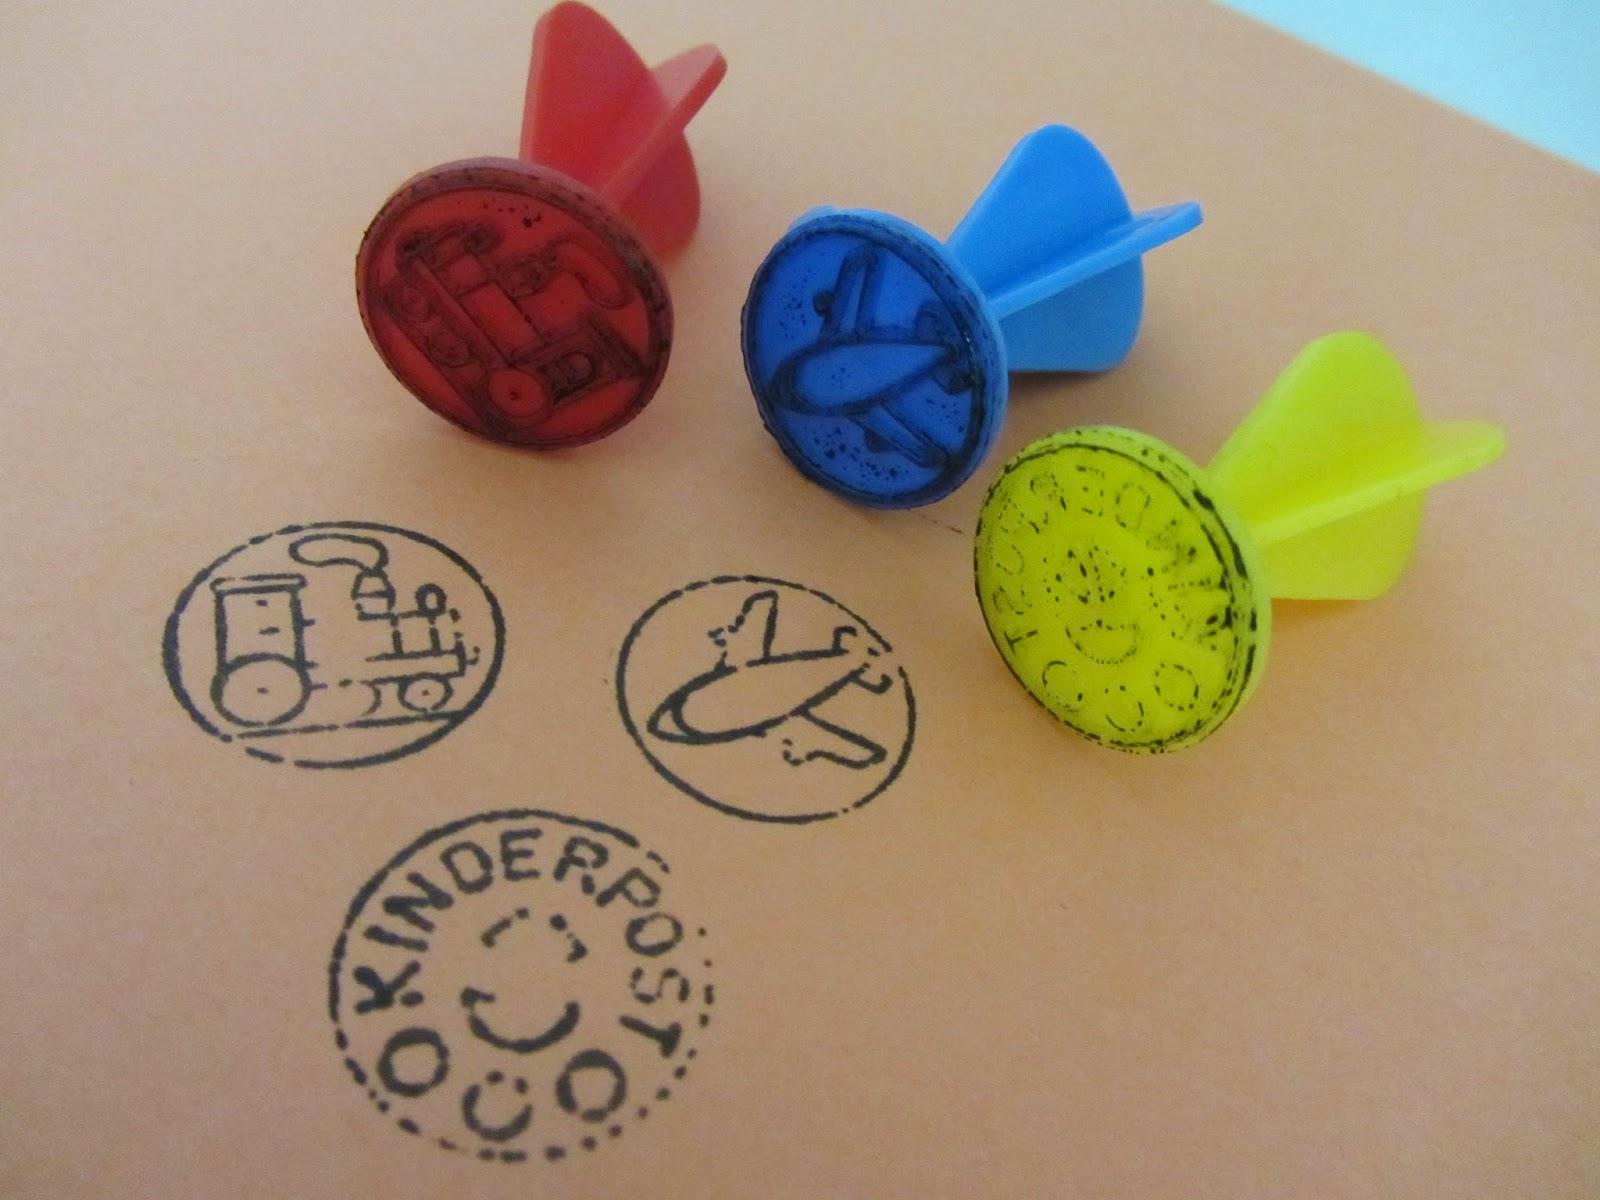 Stempel, Kinderpost, DIY Blog, Batselblog, Kreativblog, Häkelblog, Liebenswelt